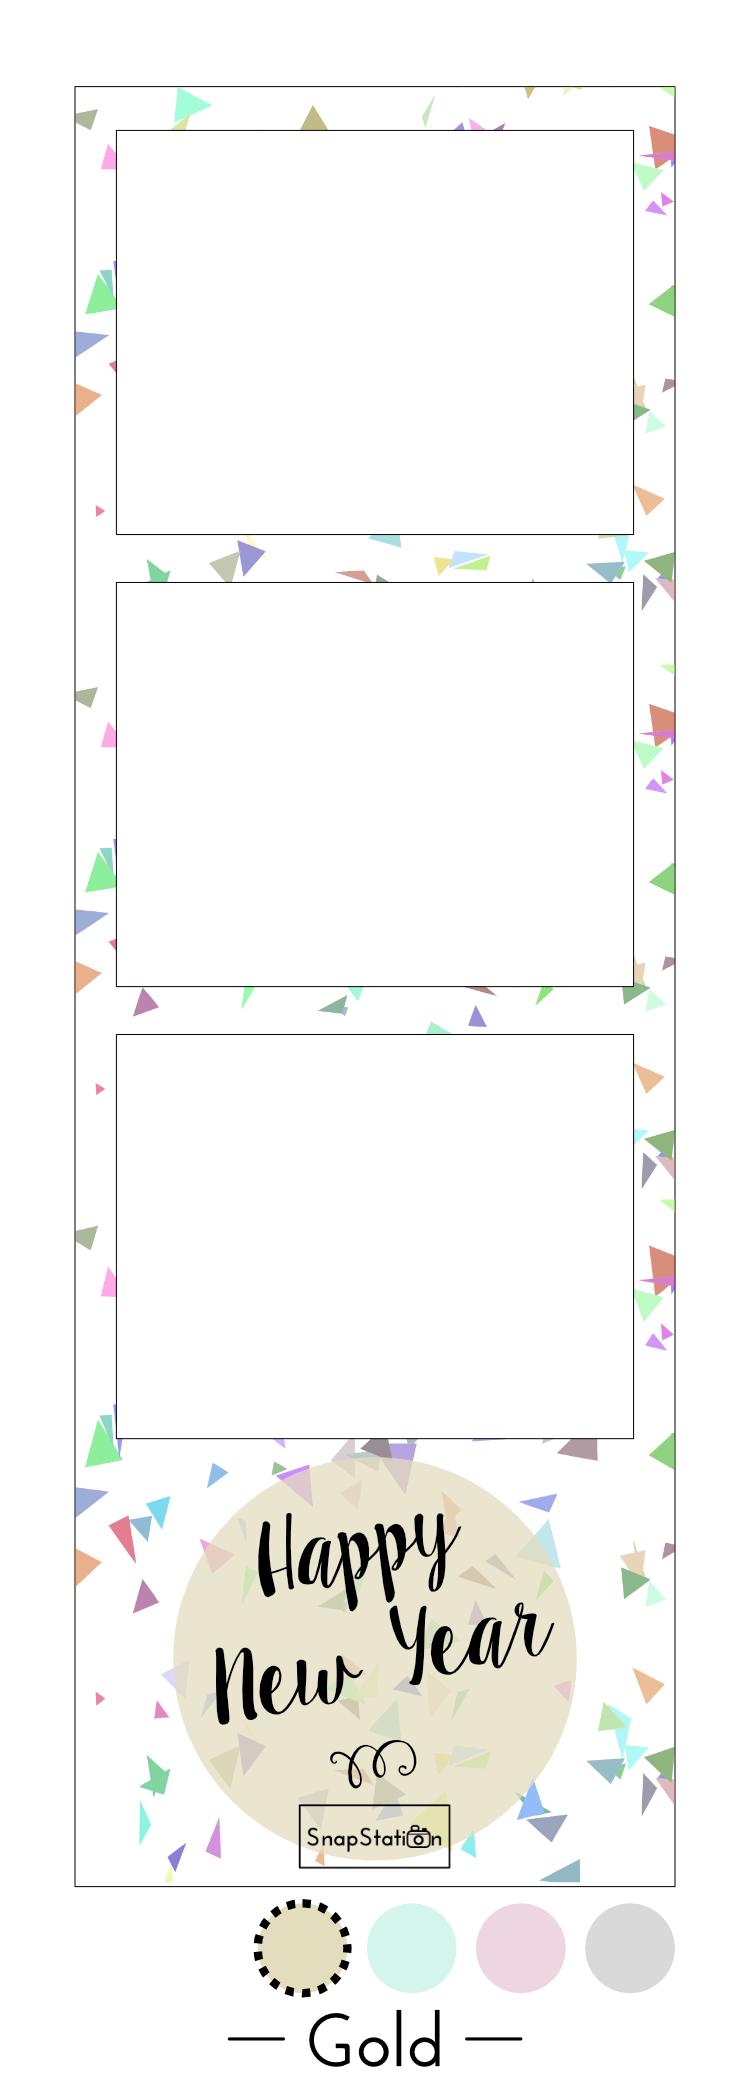 Photo strip confetti - Gold.jpg